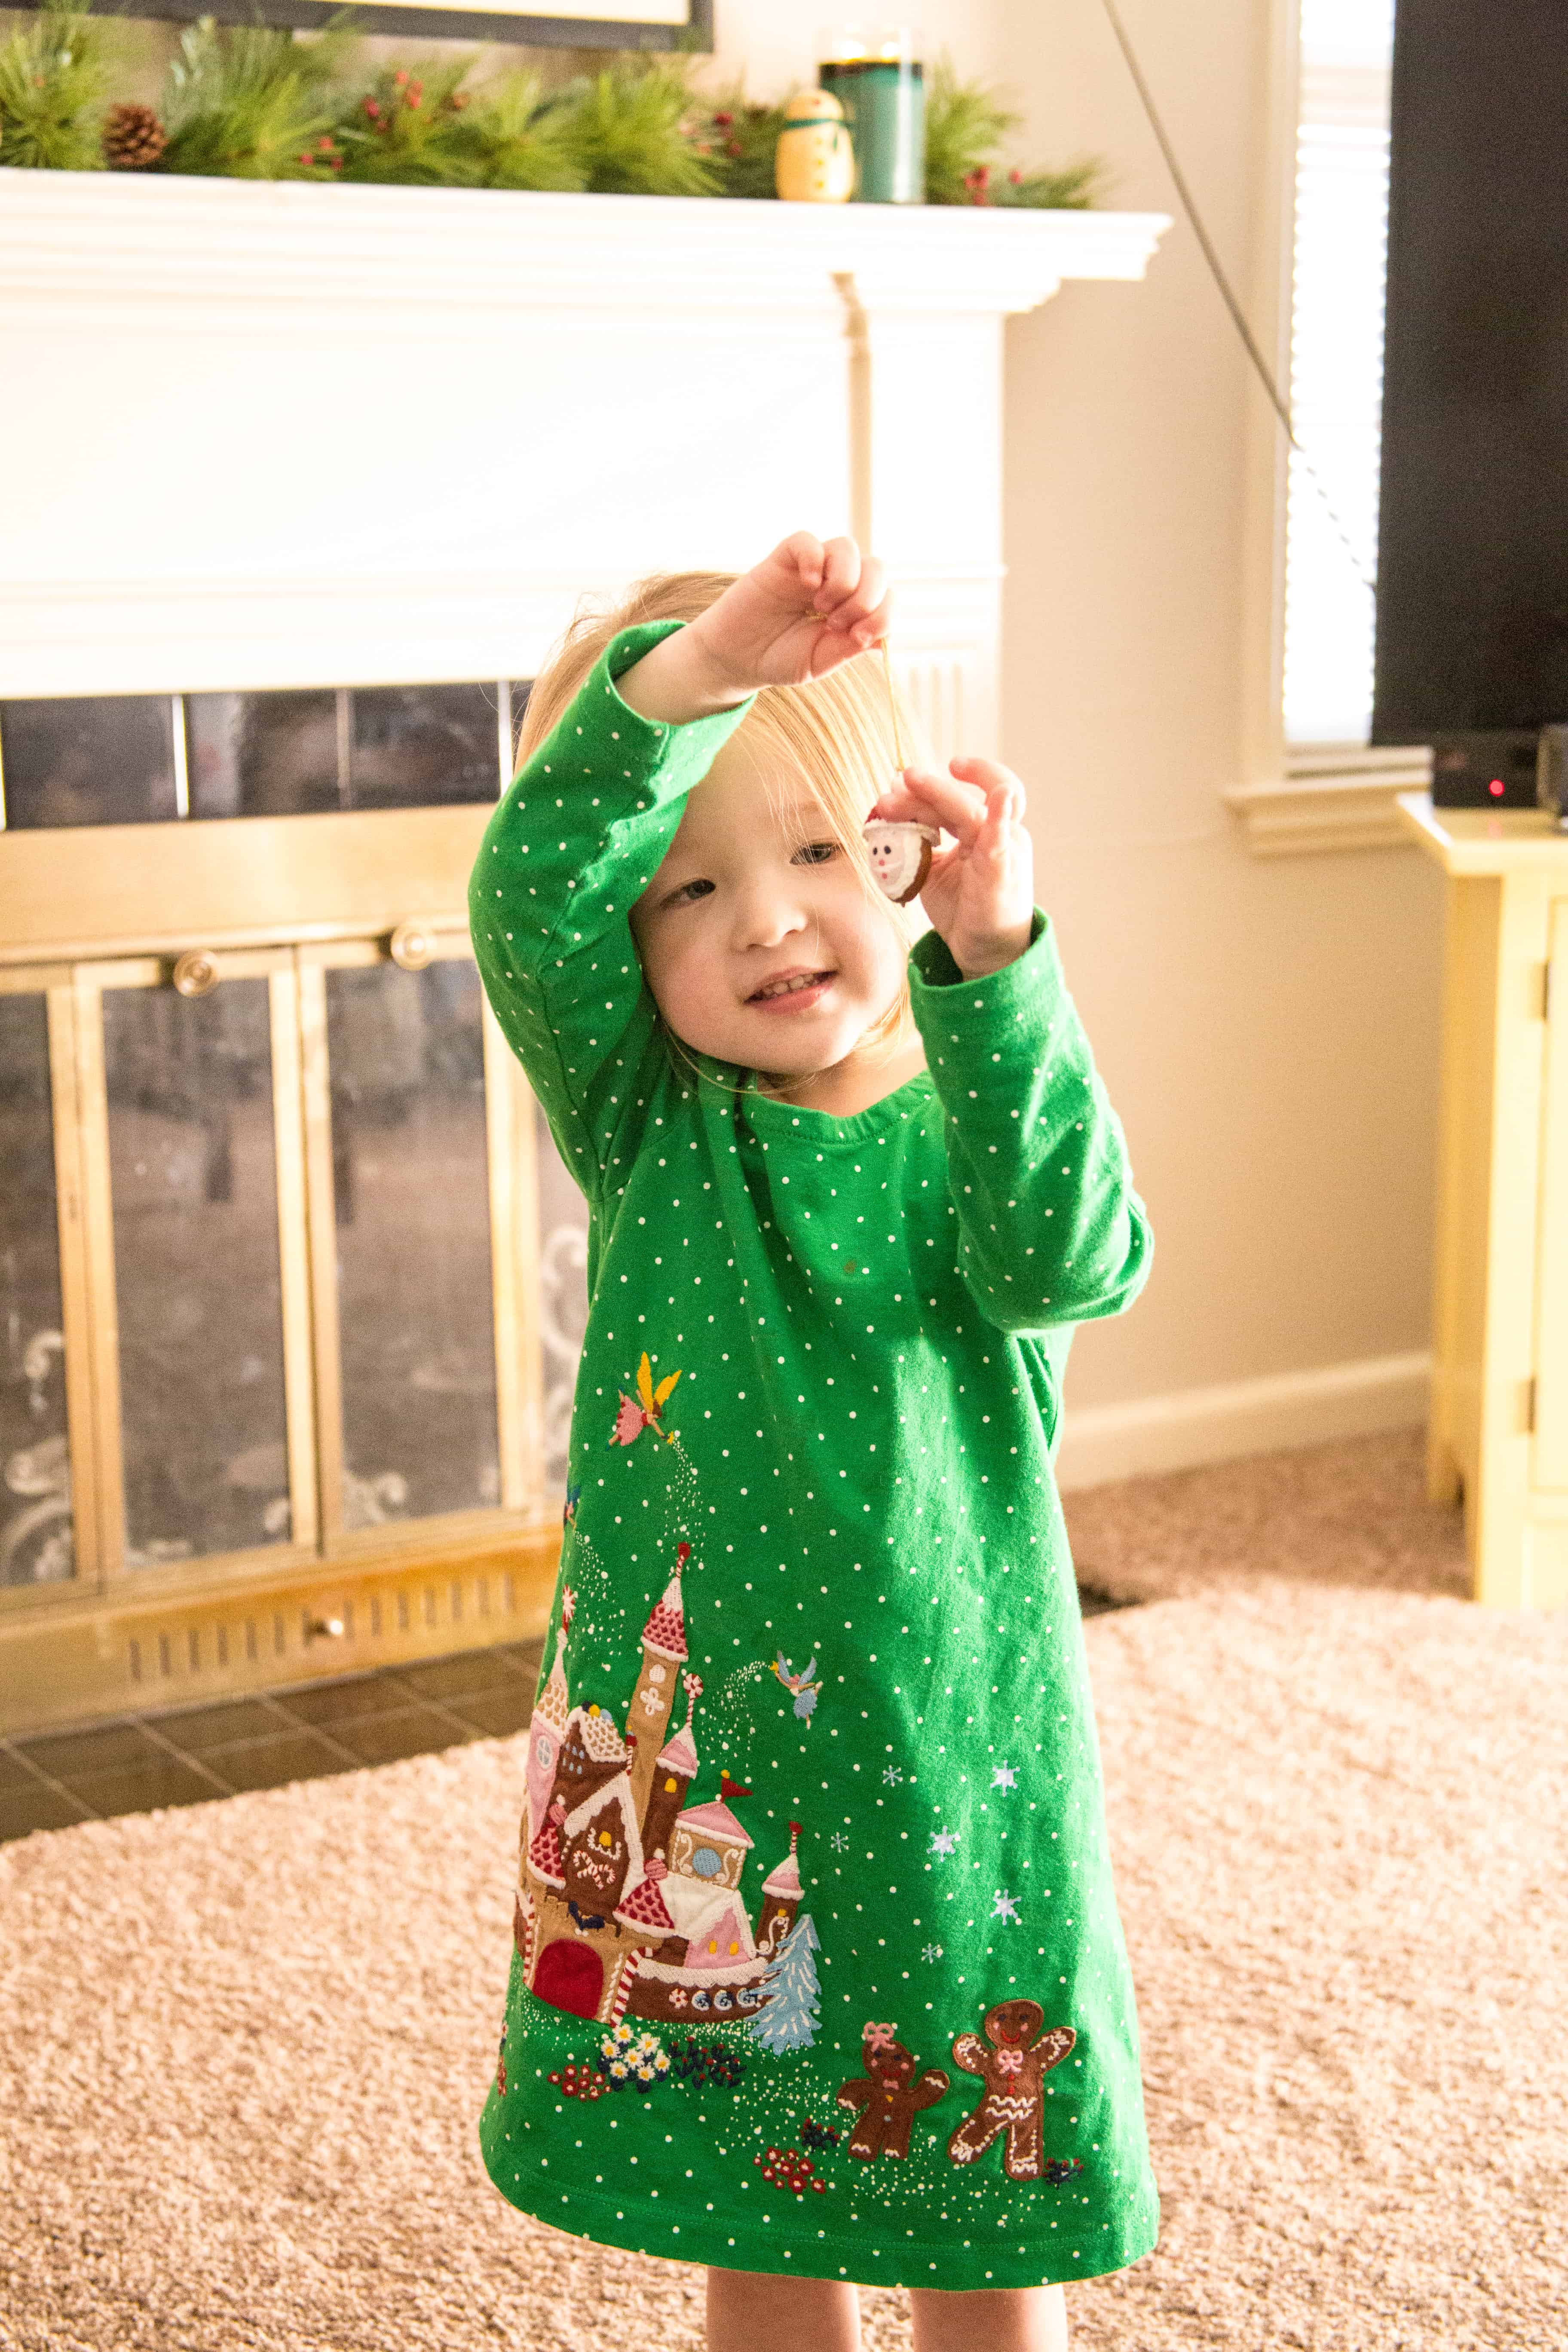 Clara holding a Christmas ornament